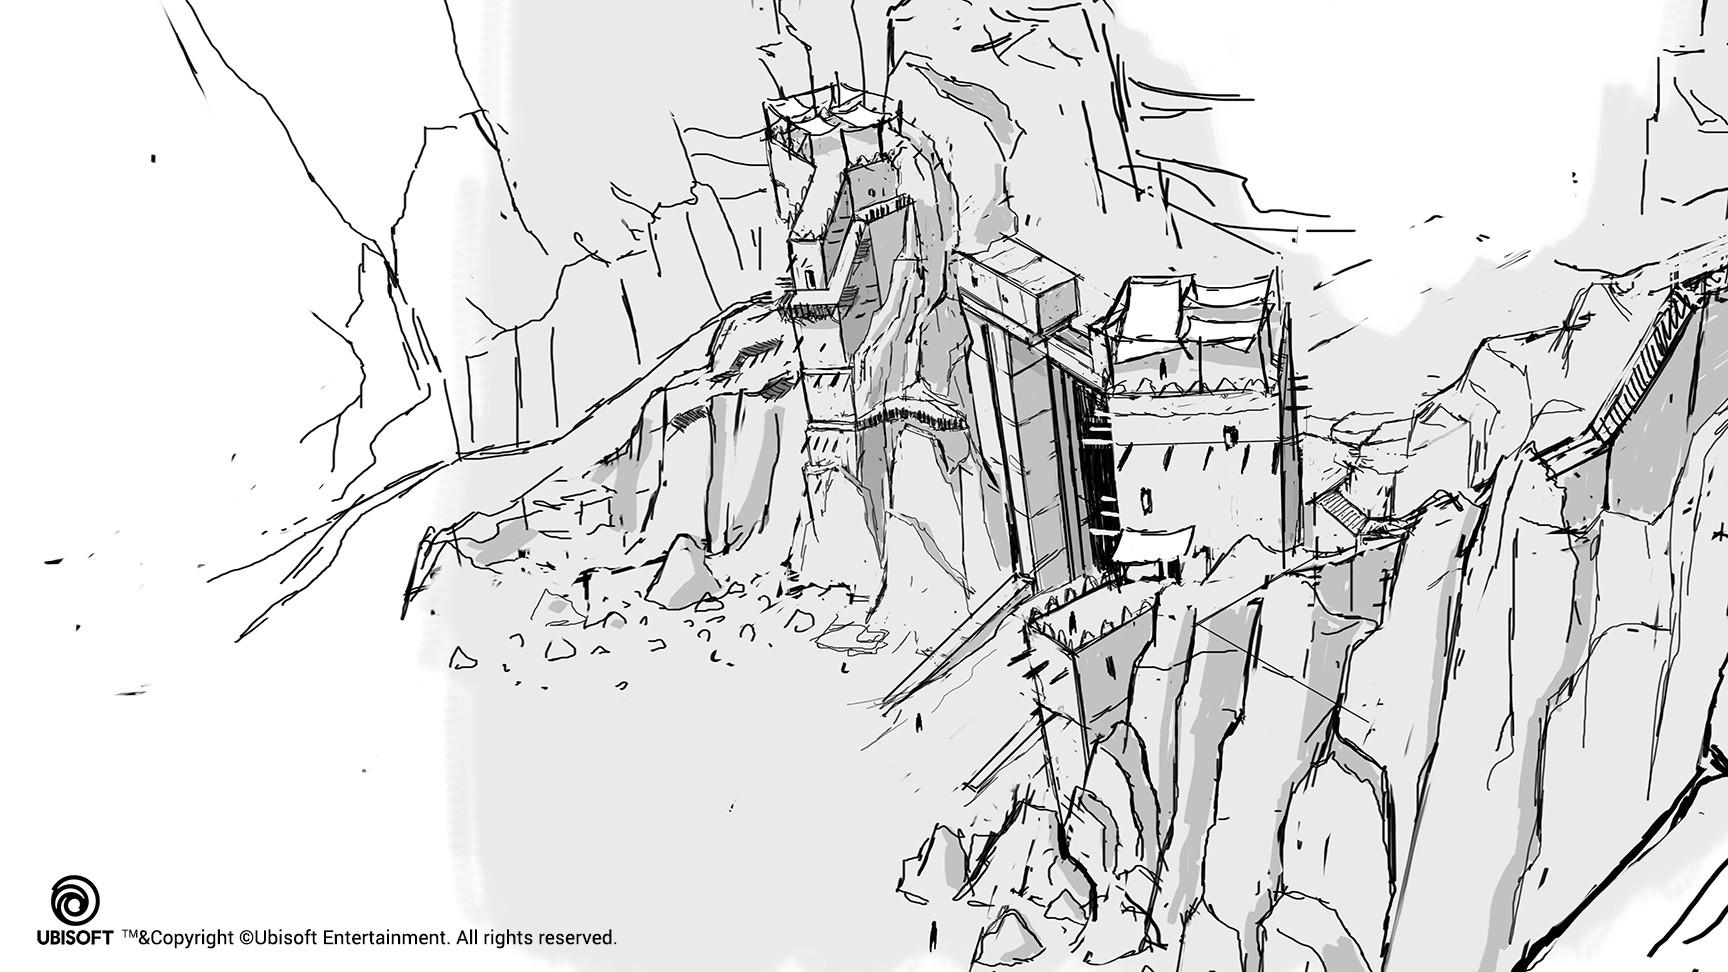 eddie-bennun-ace-env-fortification-gate-2-lr-logo-eddiebenun